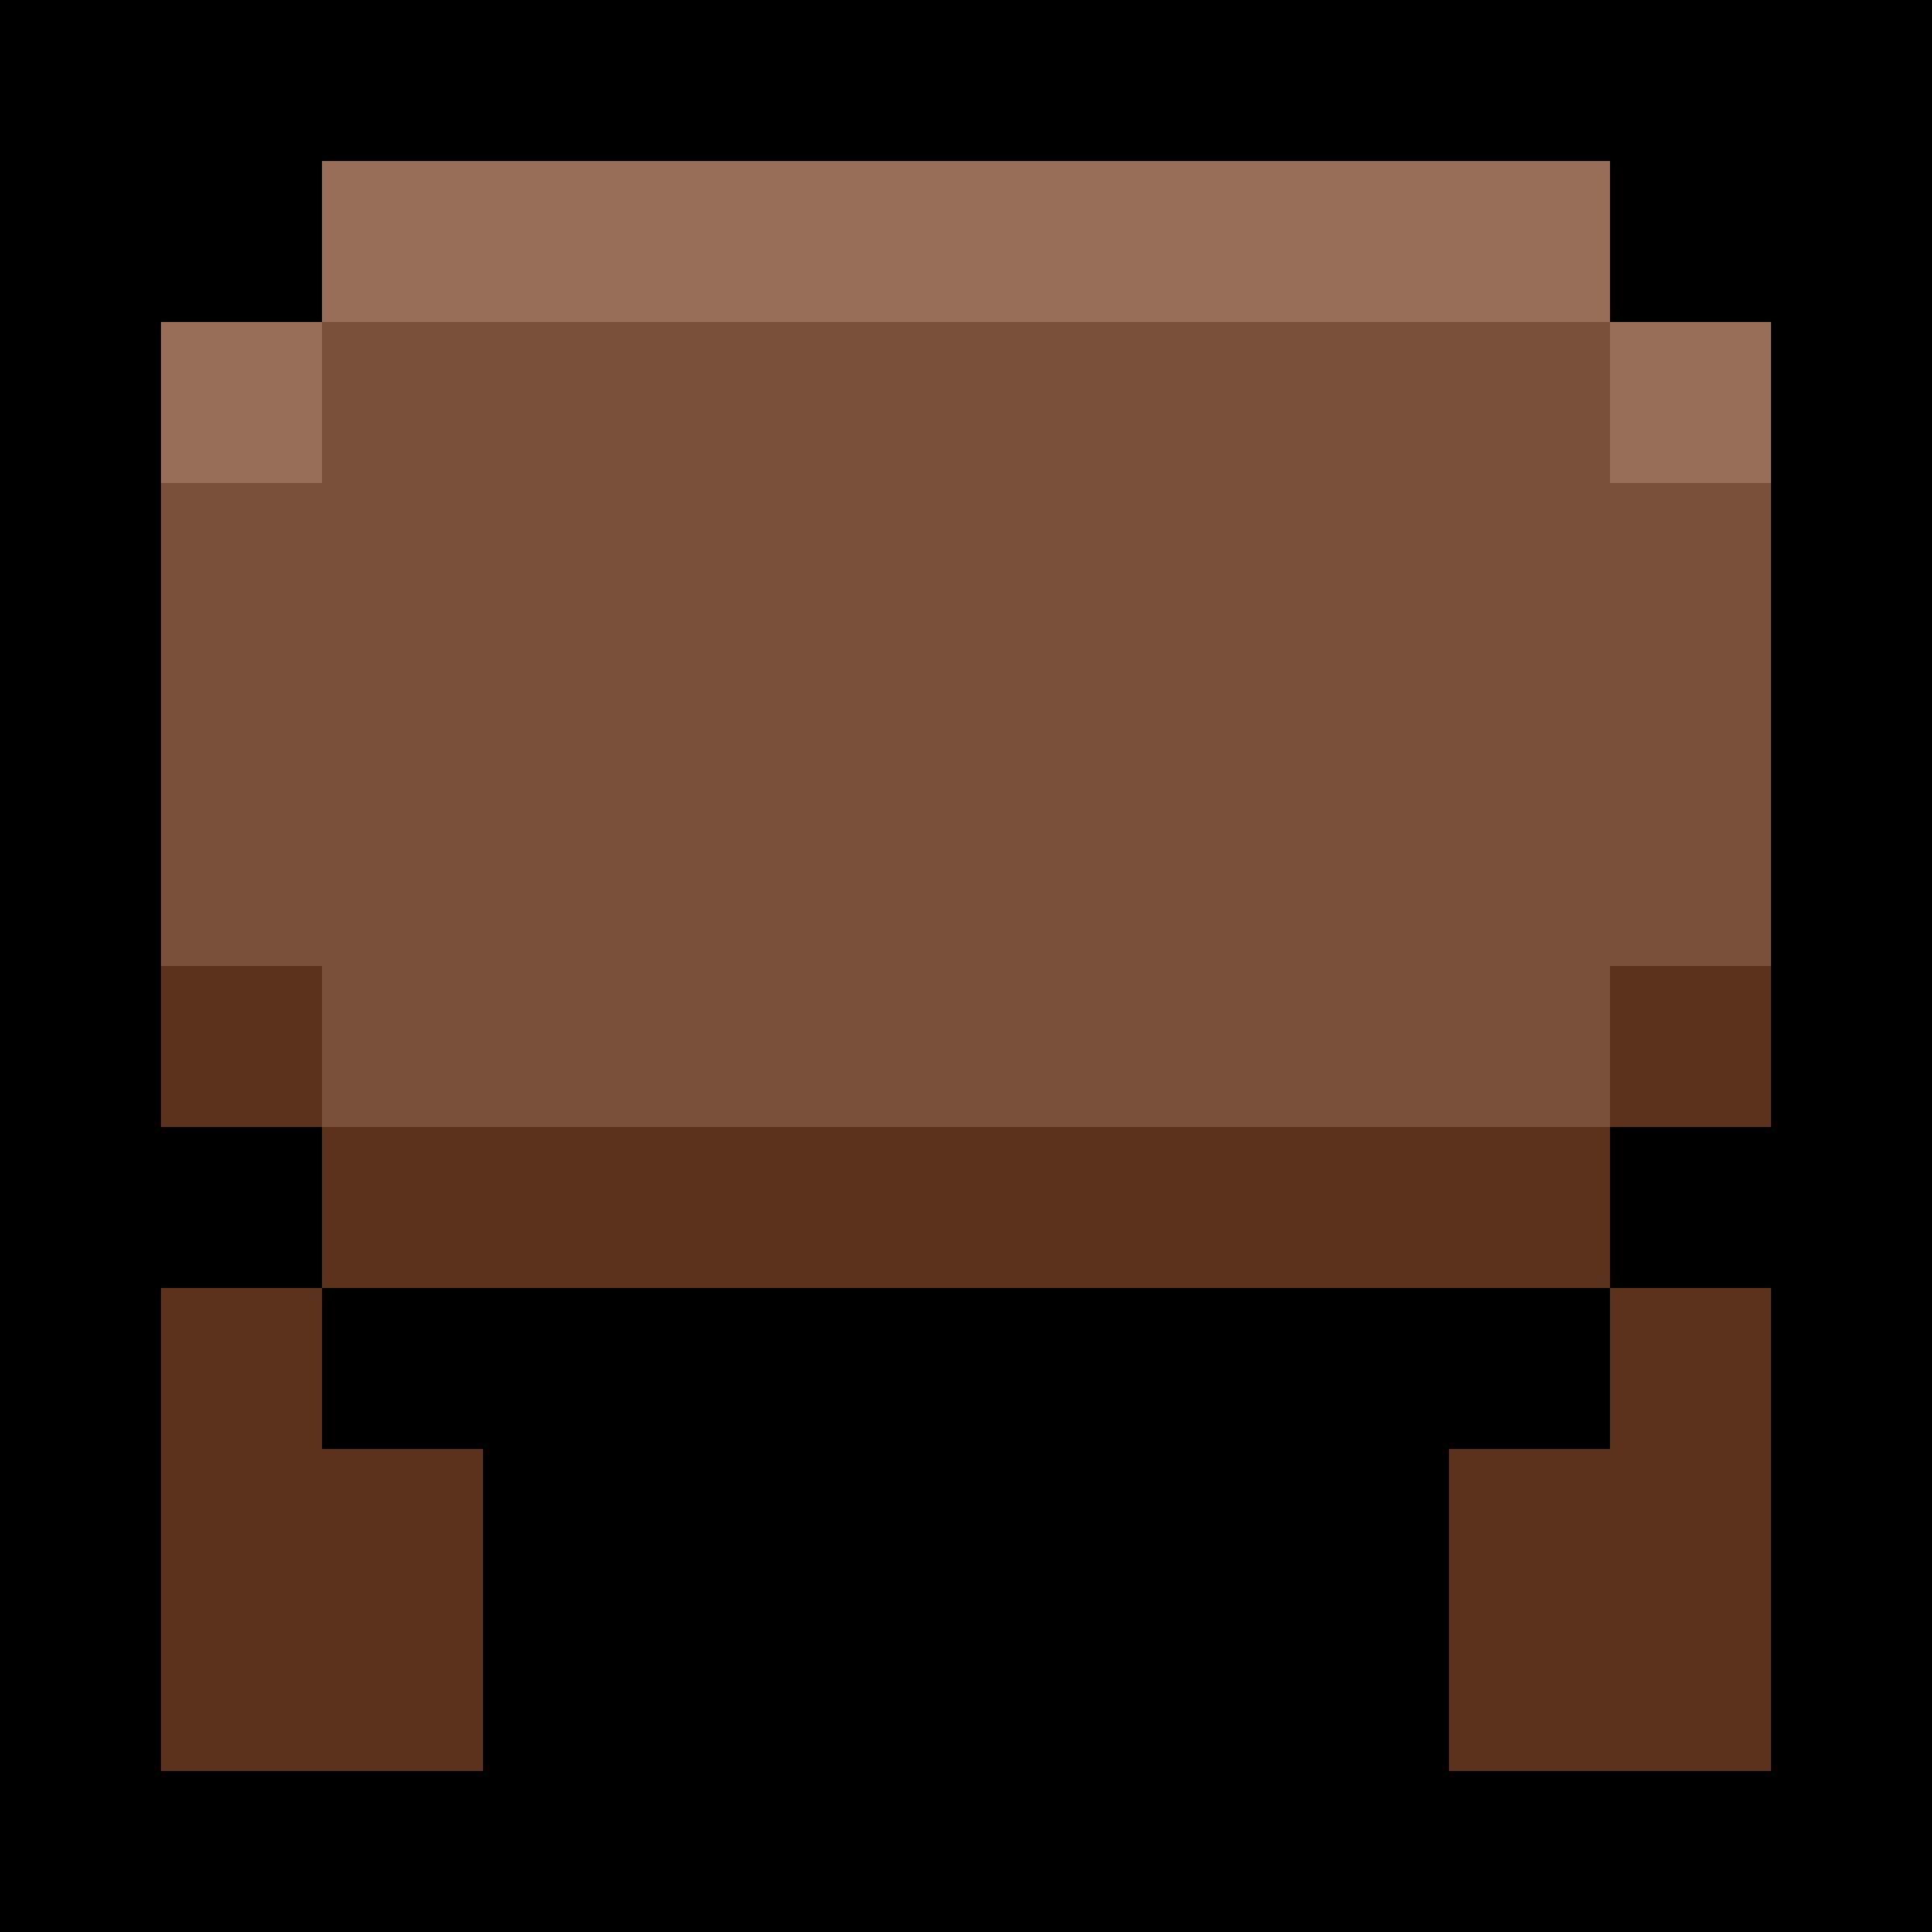 Logs brown